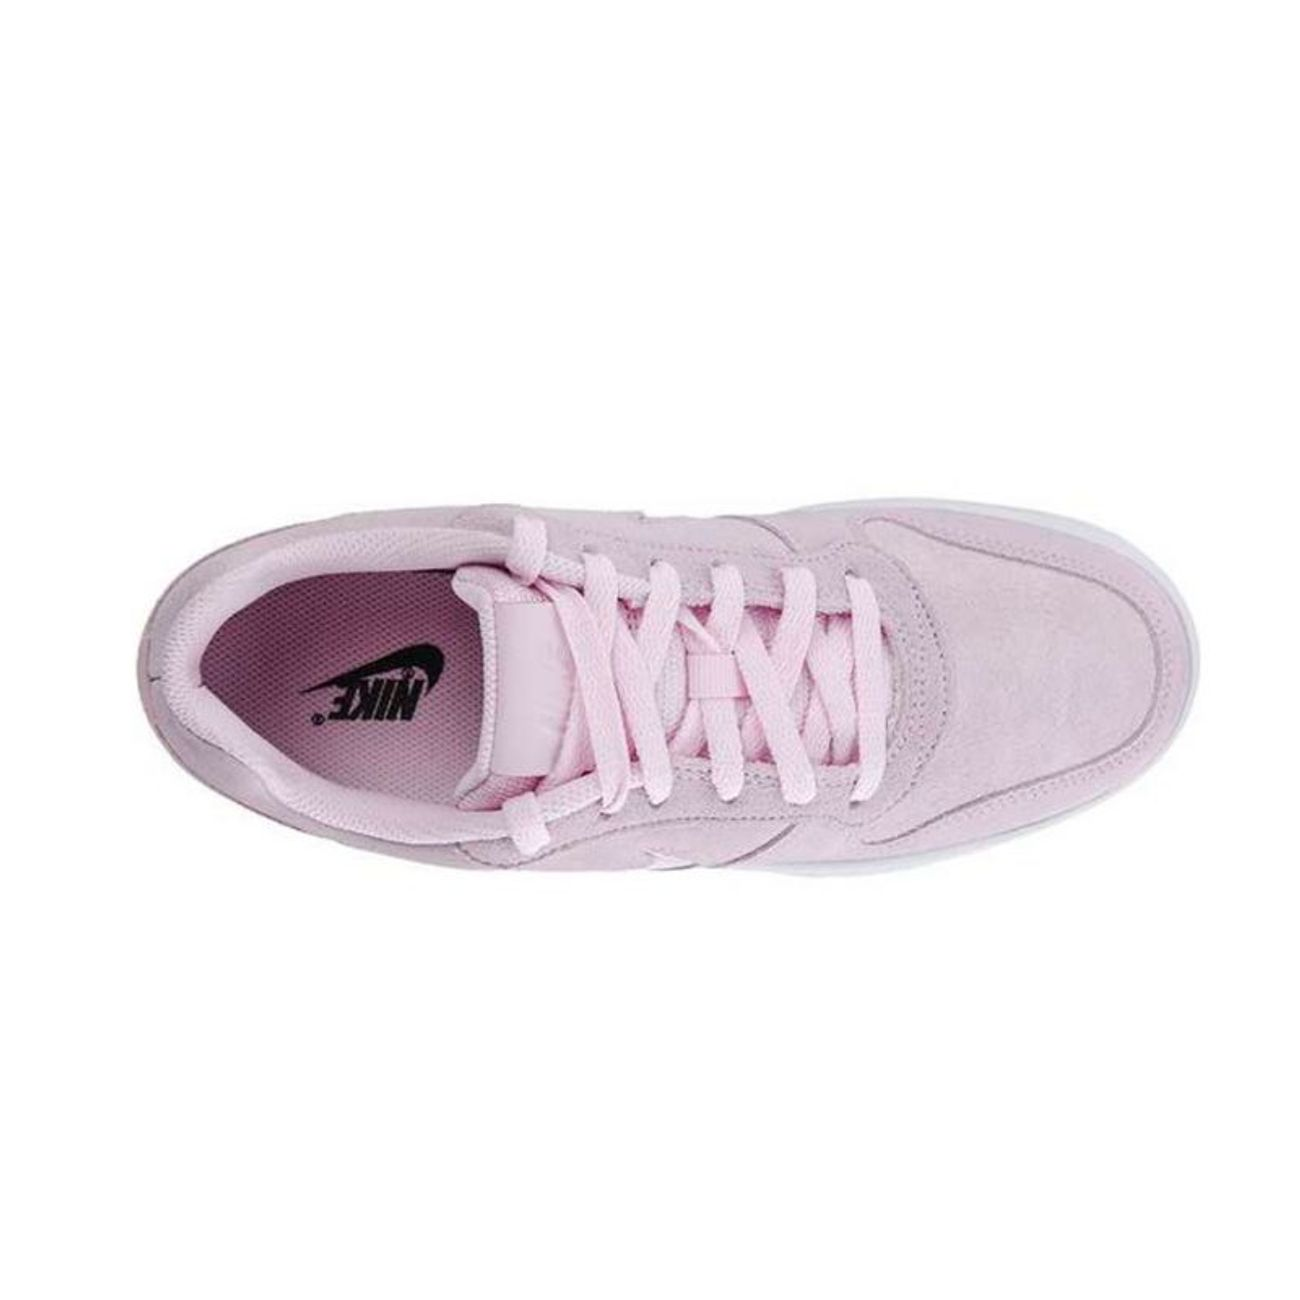 Mujer Adulte Rosa Low Premium Nike Ebernon Padel Niaq2232 600 MVzSpGqU